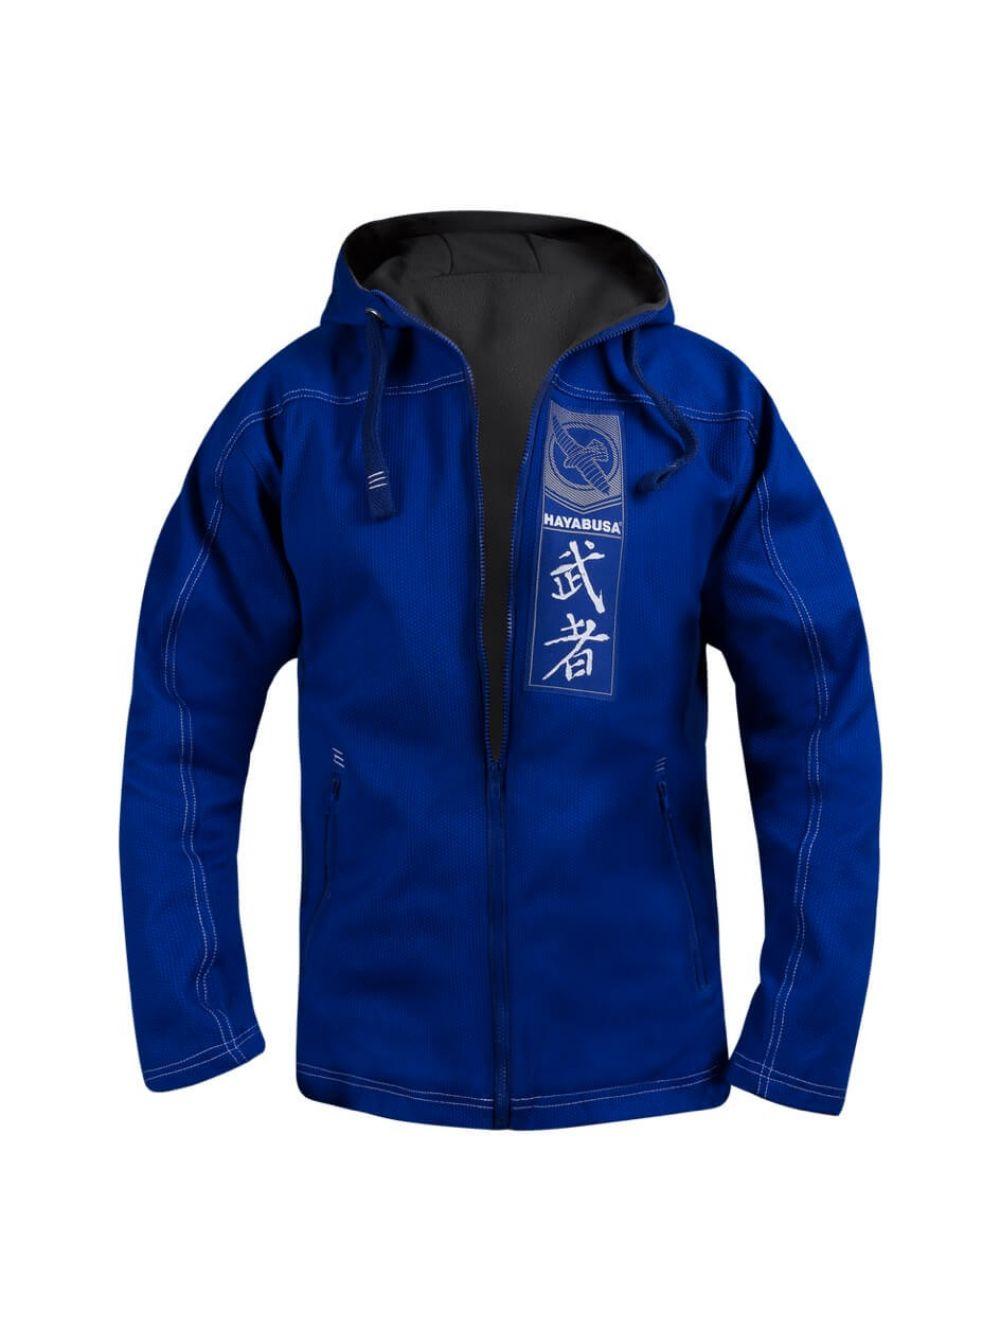 Купить Толстовка Hayabusa Uwagi Gi Jacket 3.0 Blue, 5137_bl